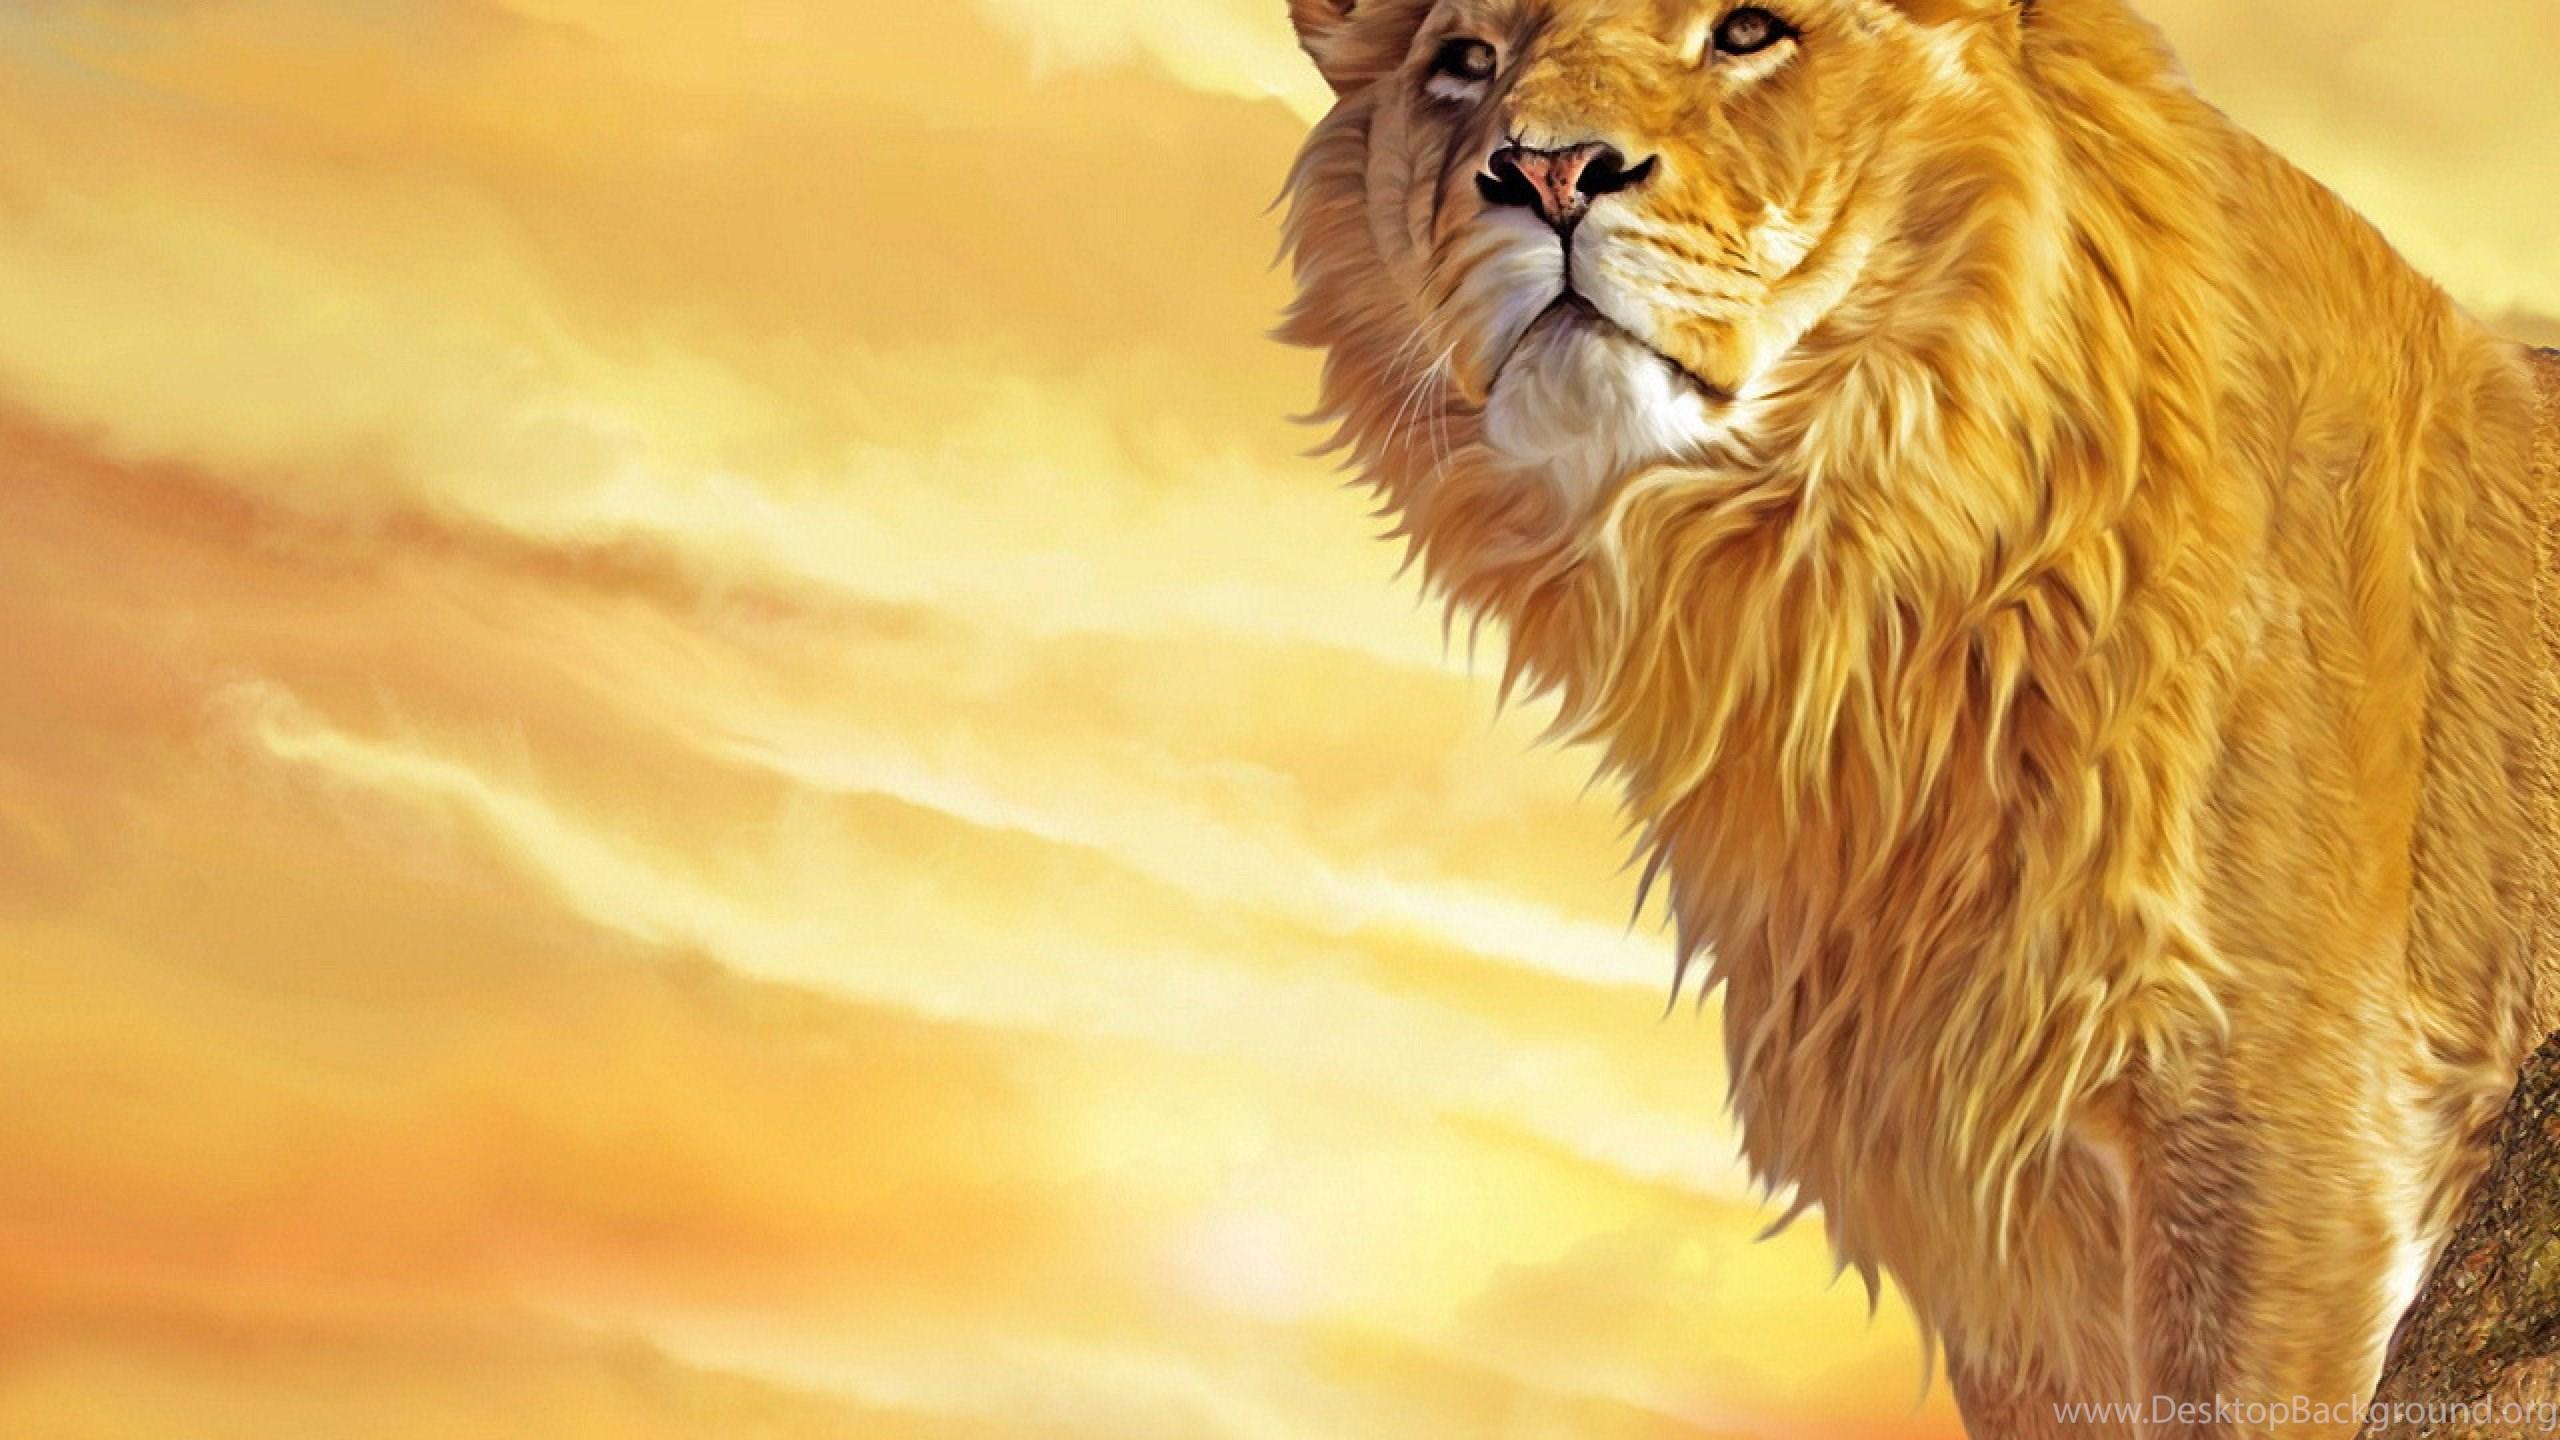 Hd Lion Wallpapers Desktop Background